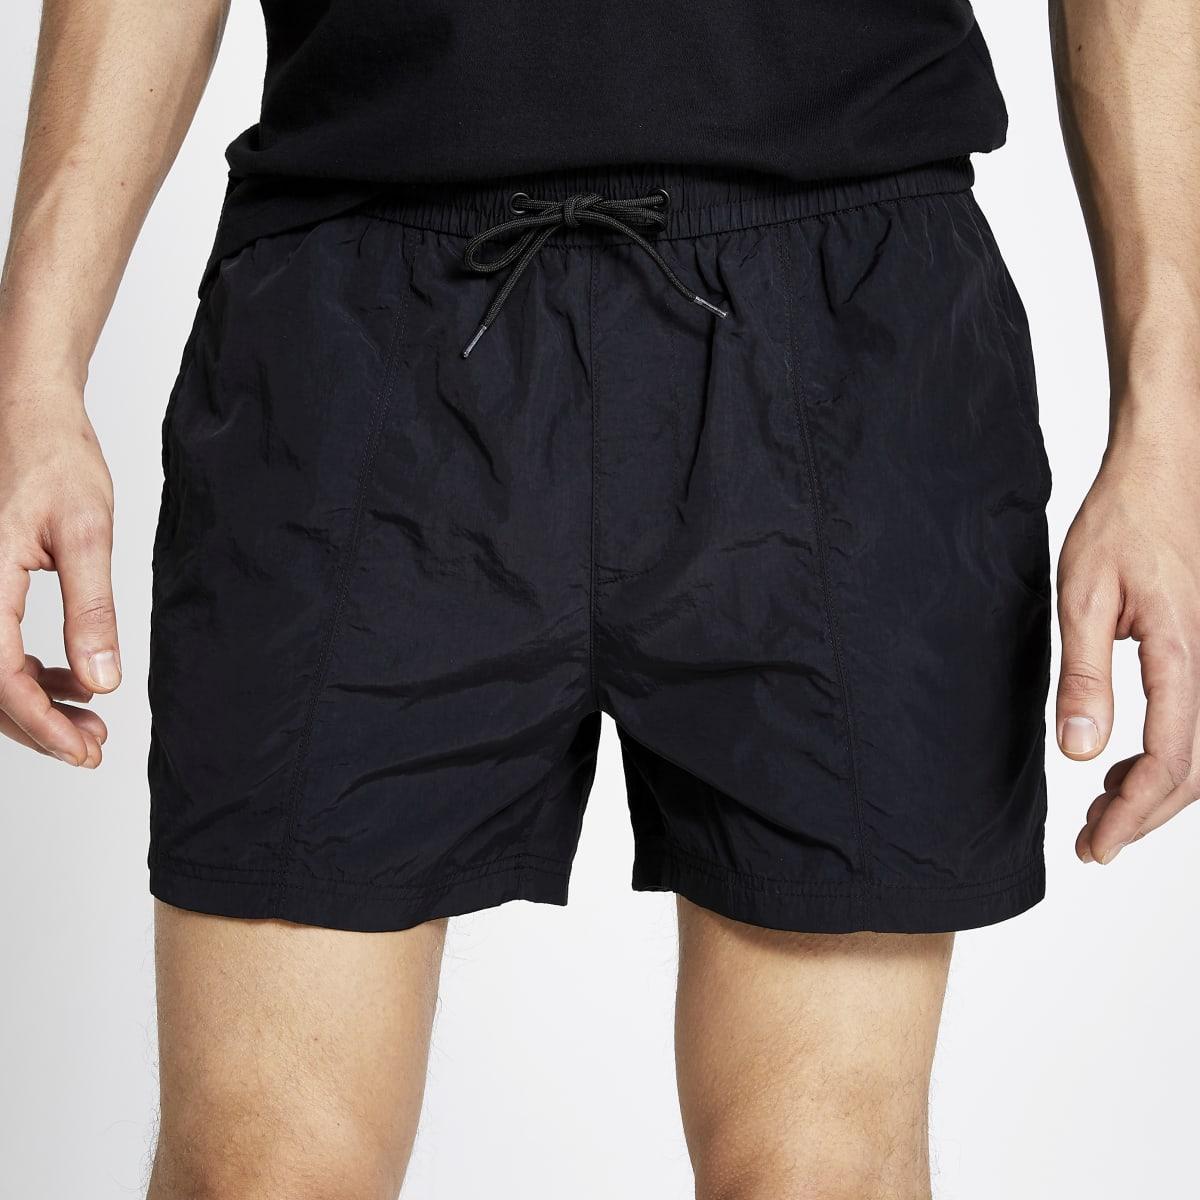 Pastel Tech black drawstring swim shorts